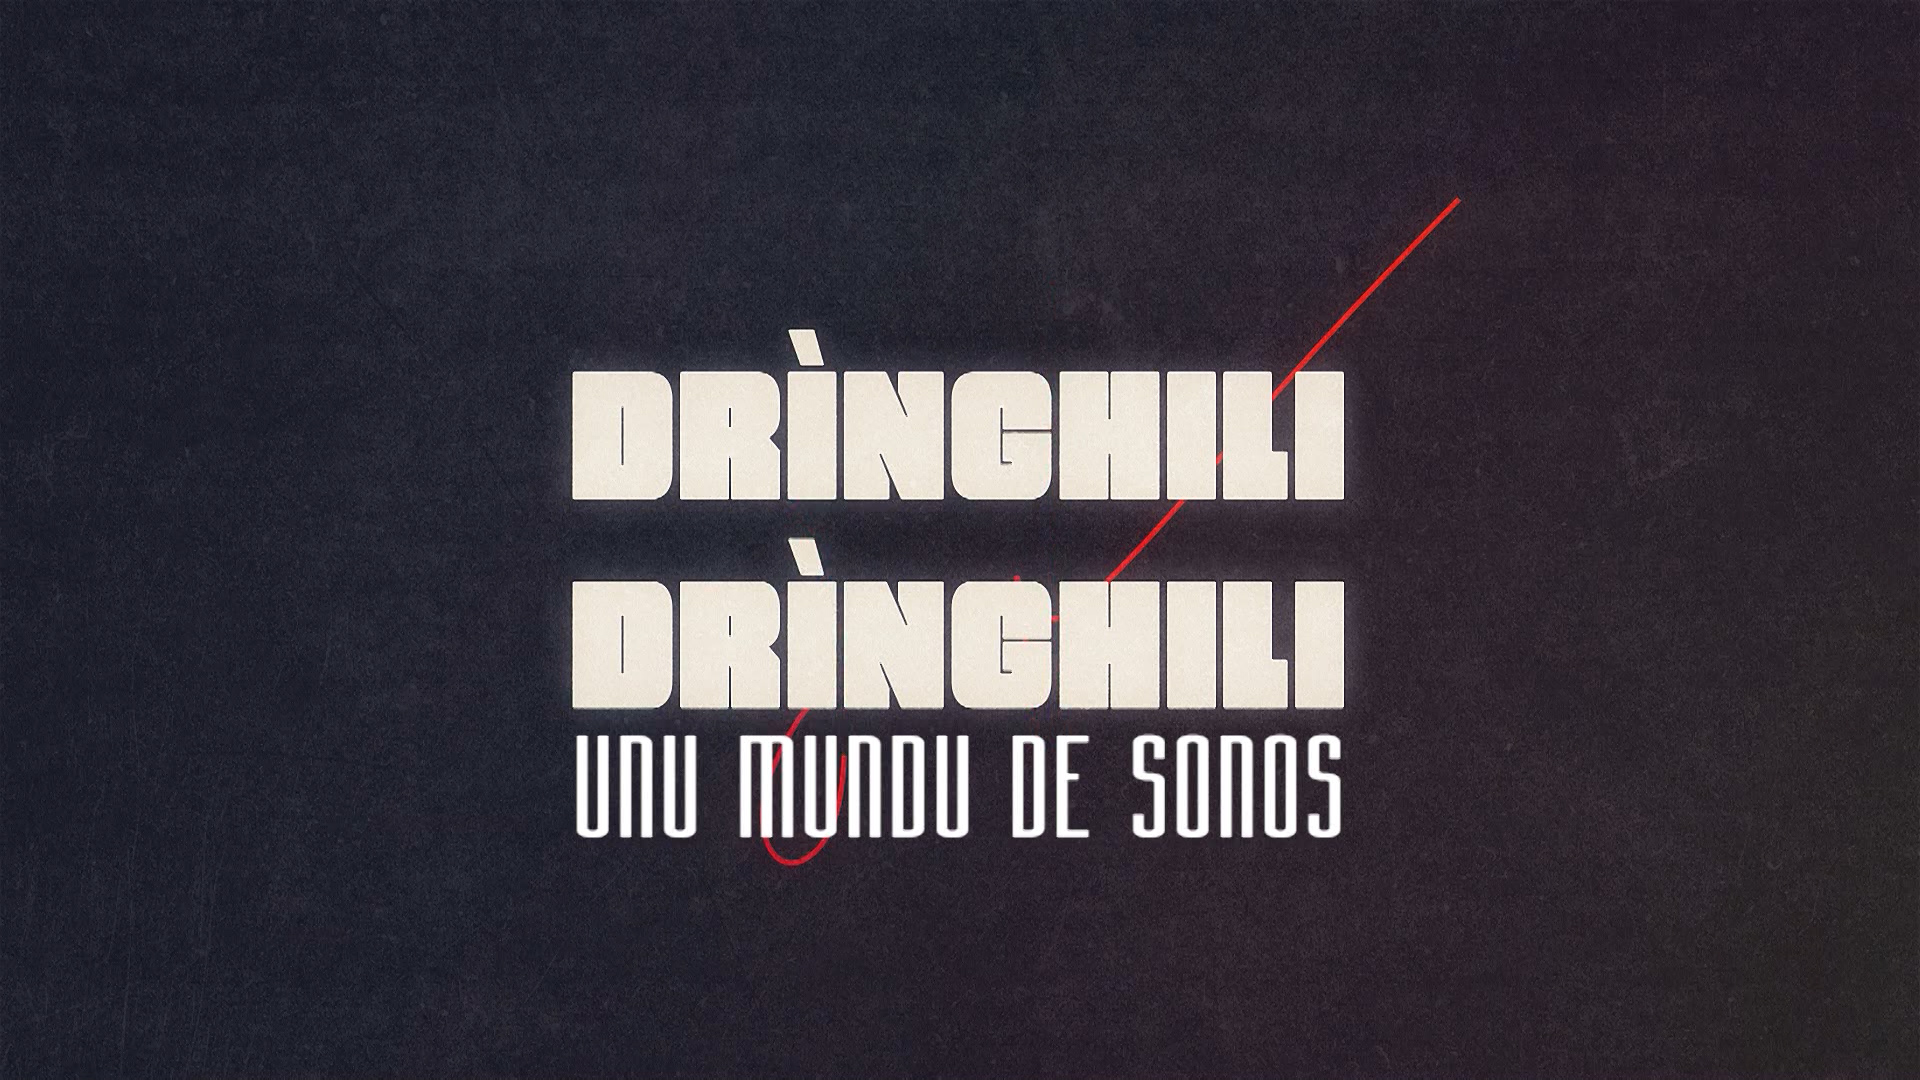 DRINGHILI DRINGHILI